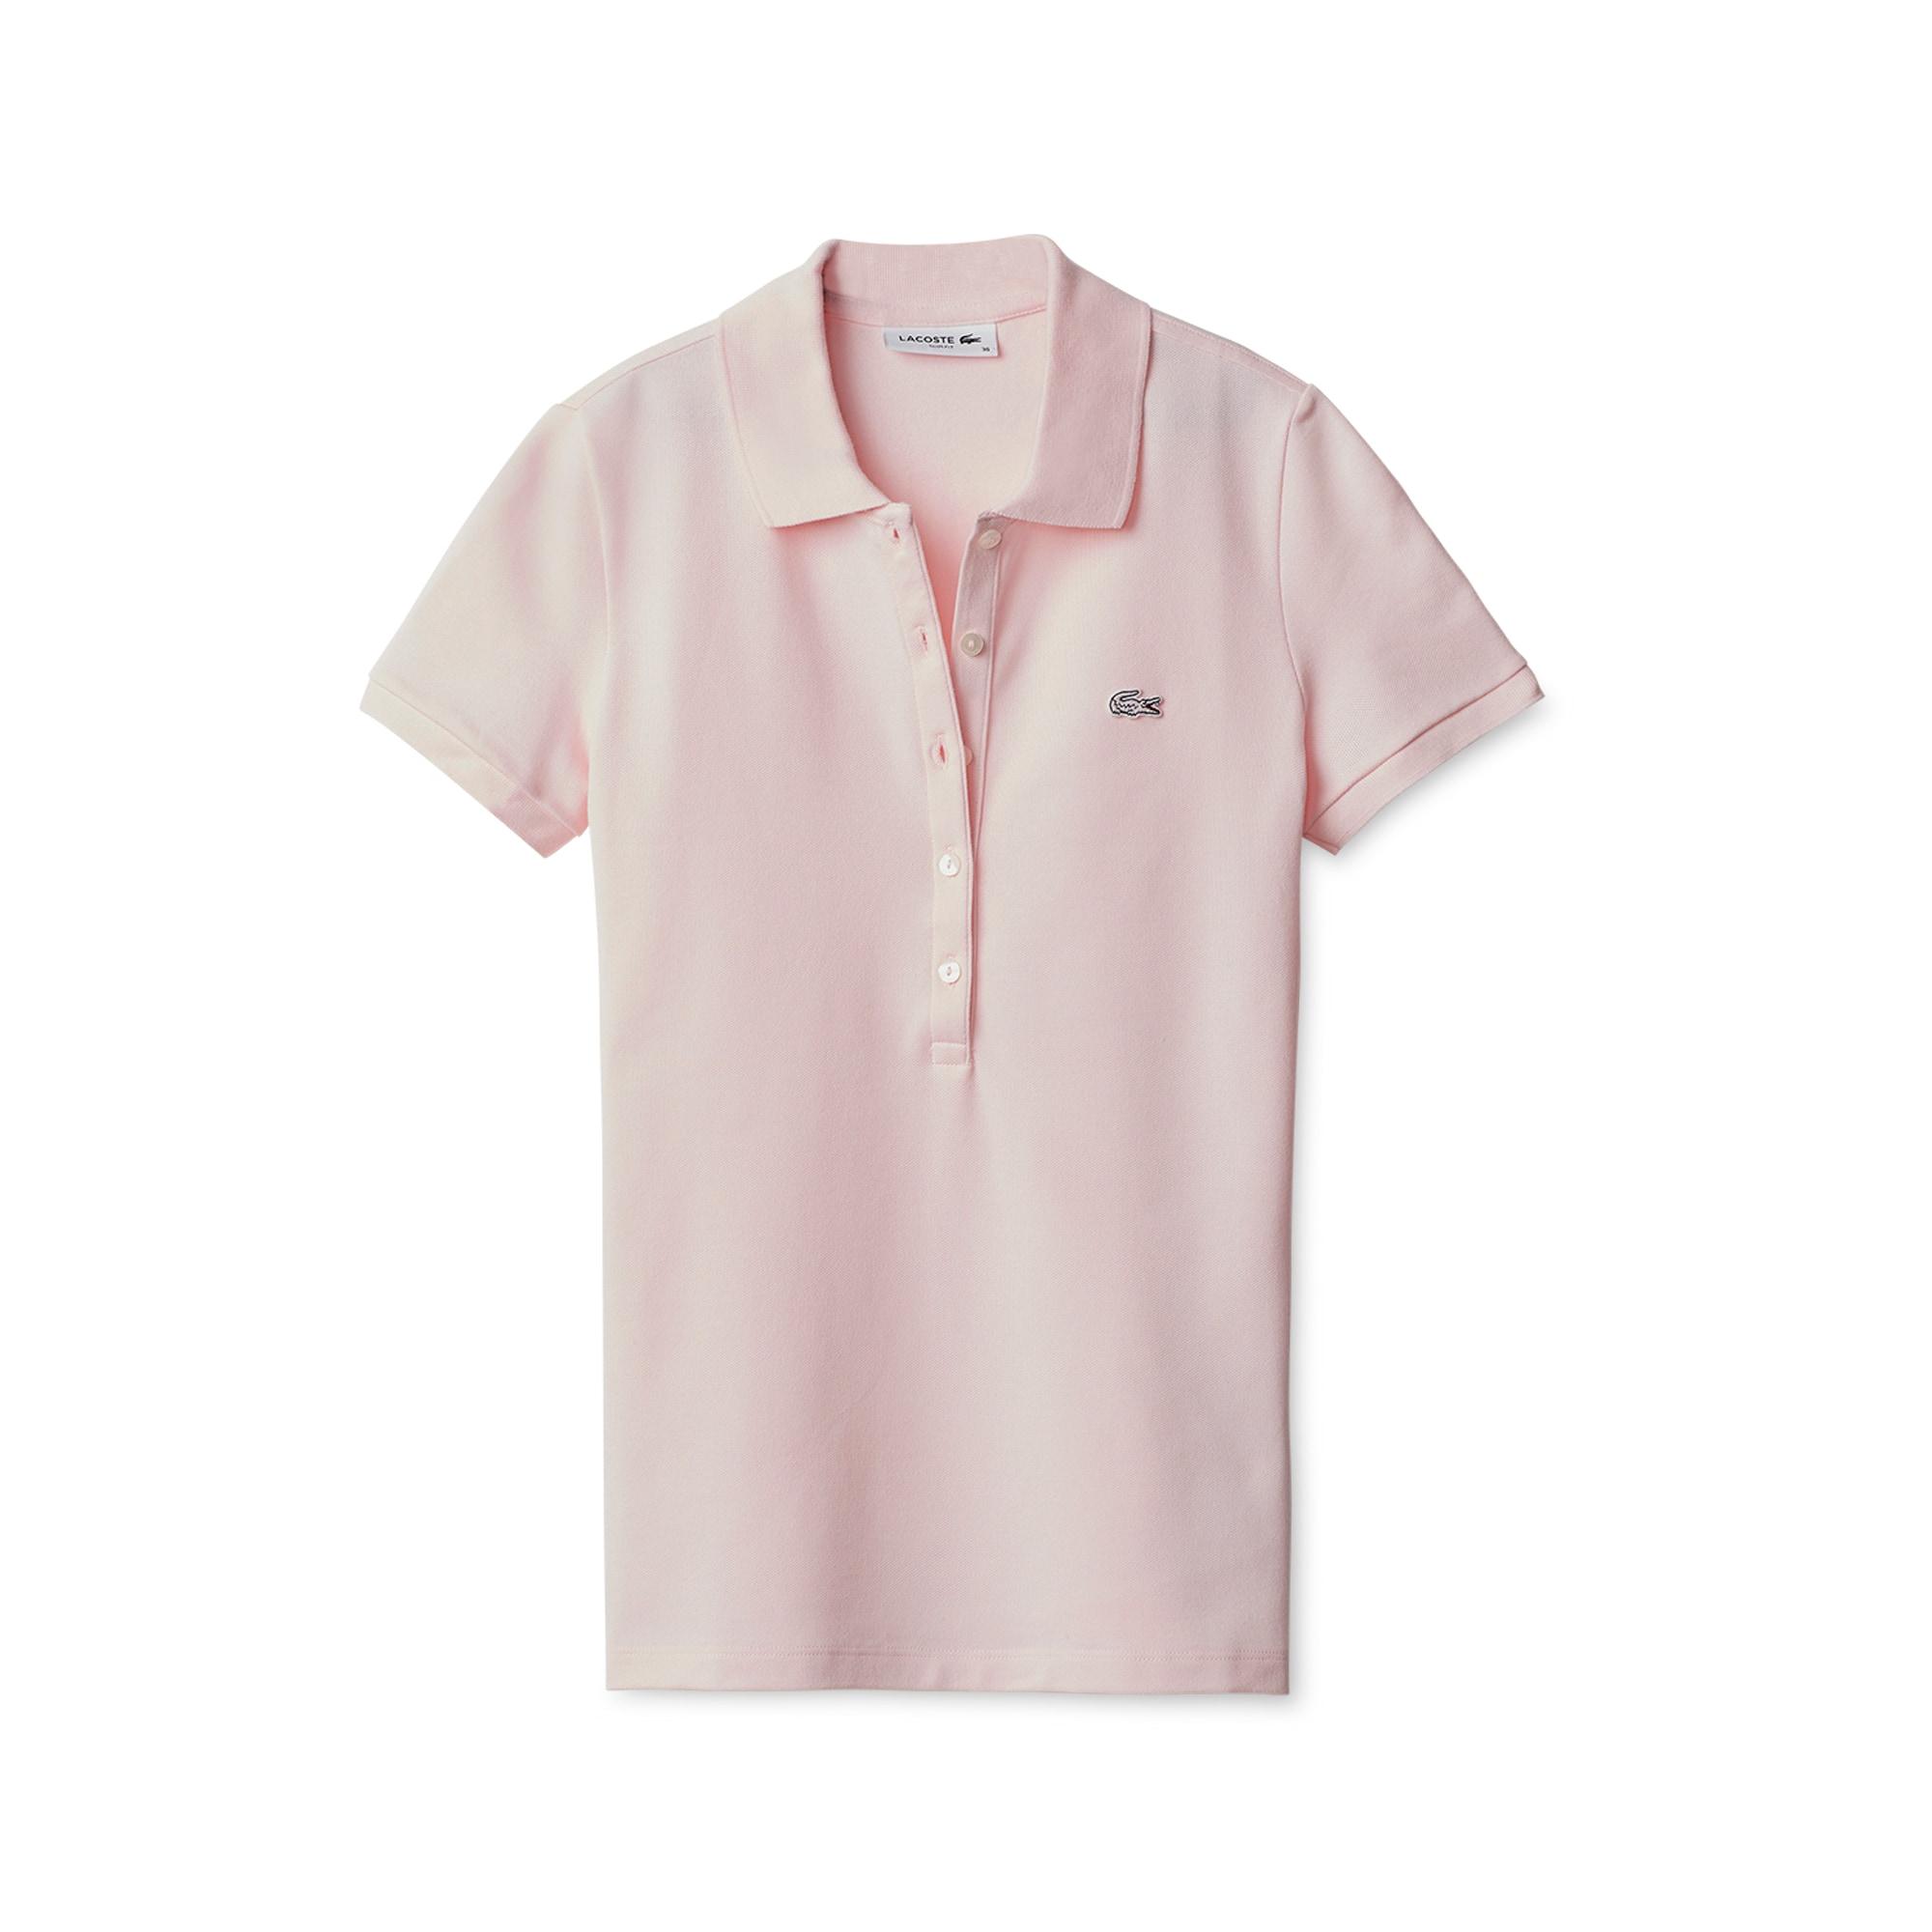 8bf19e9b76 Camisas polo para mulheres  manga longa e sem manga